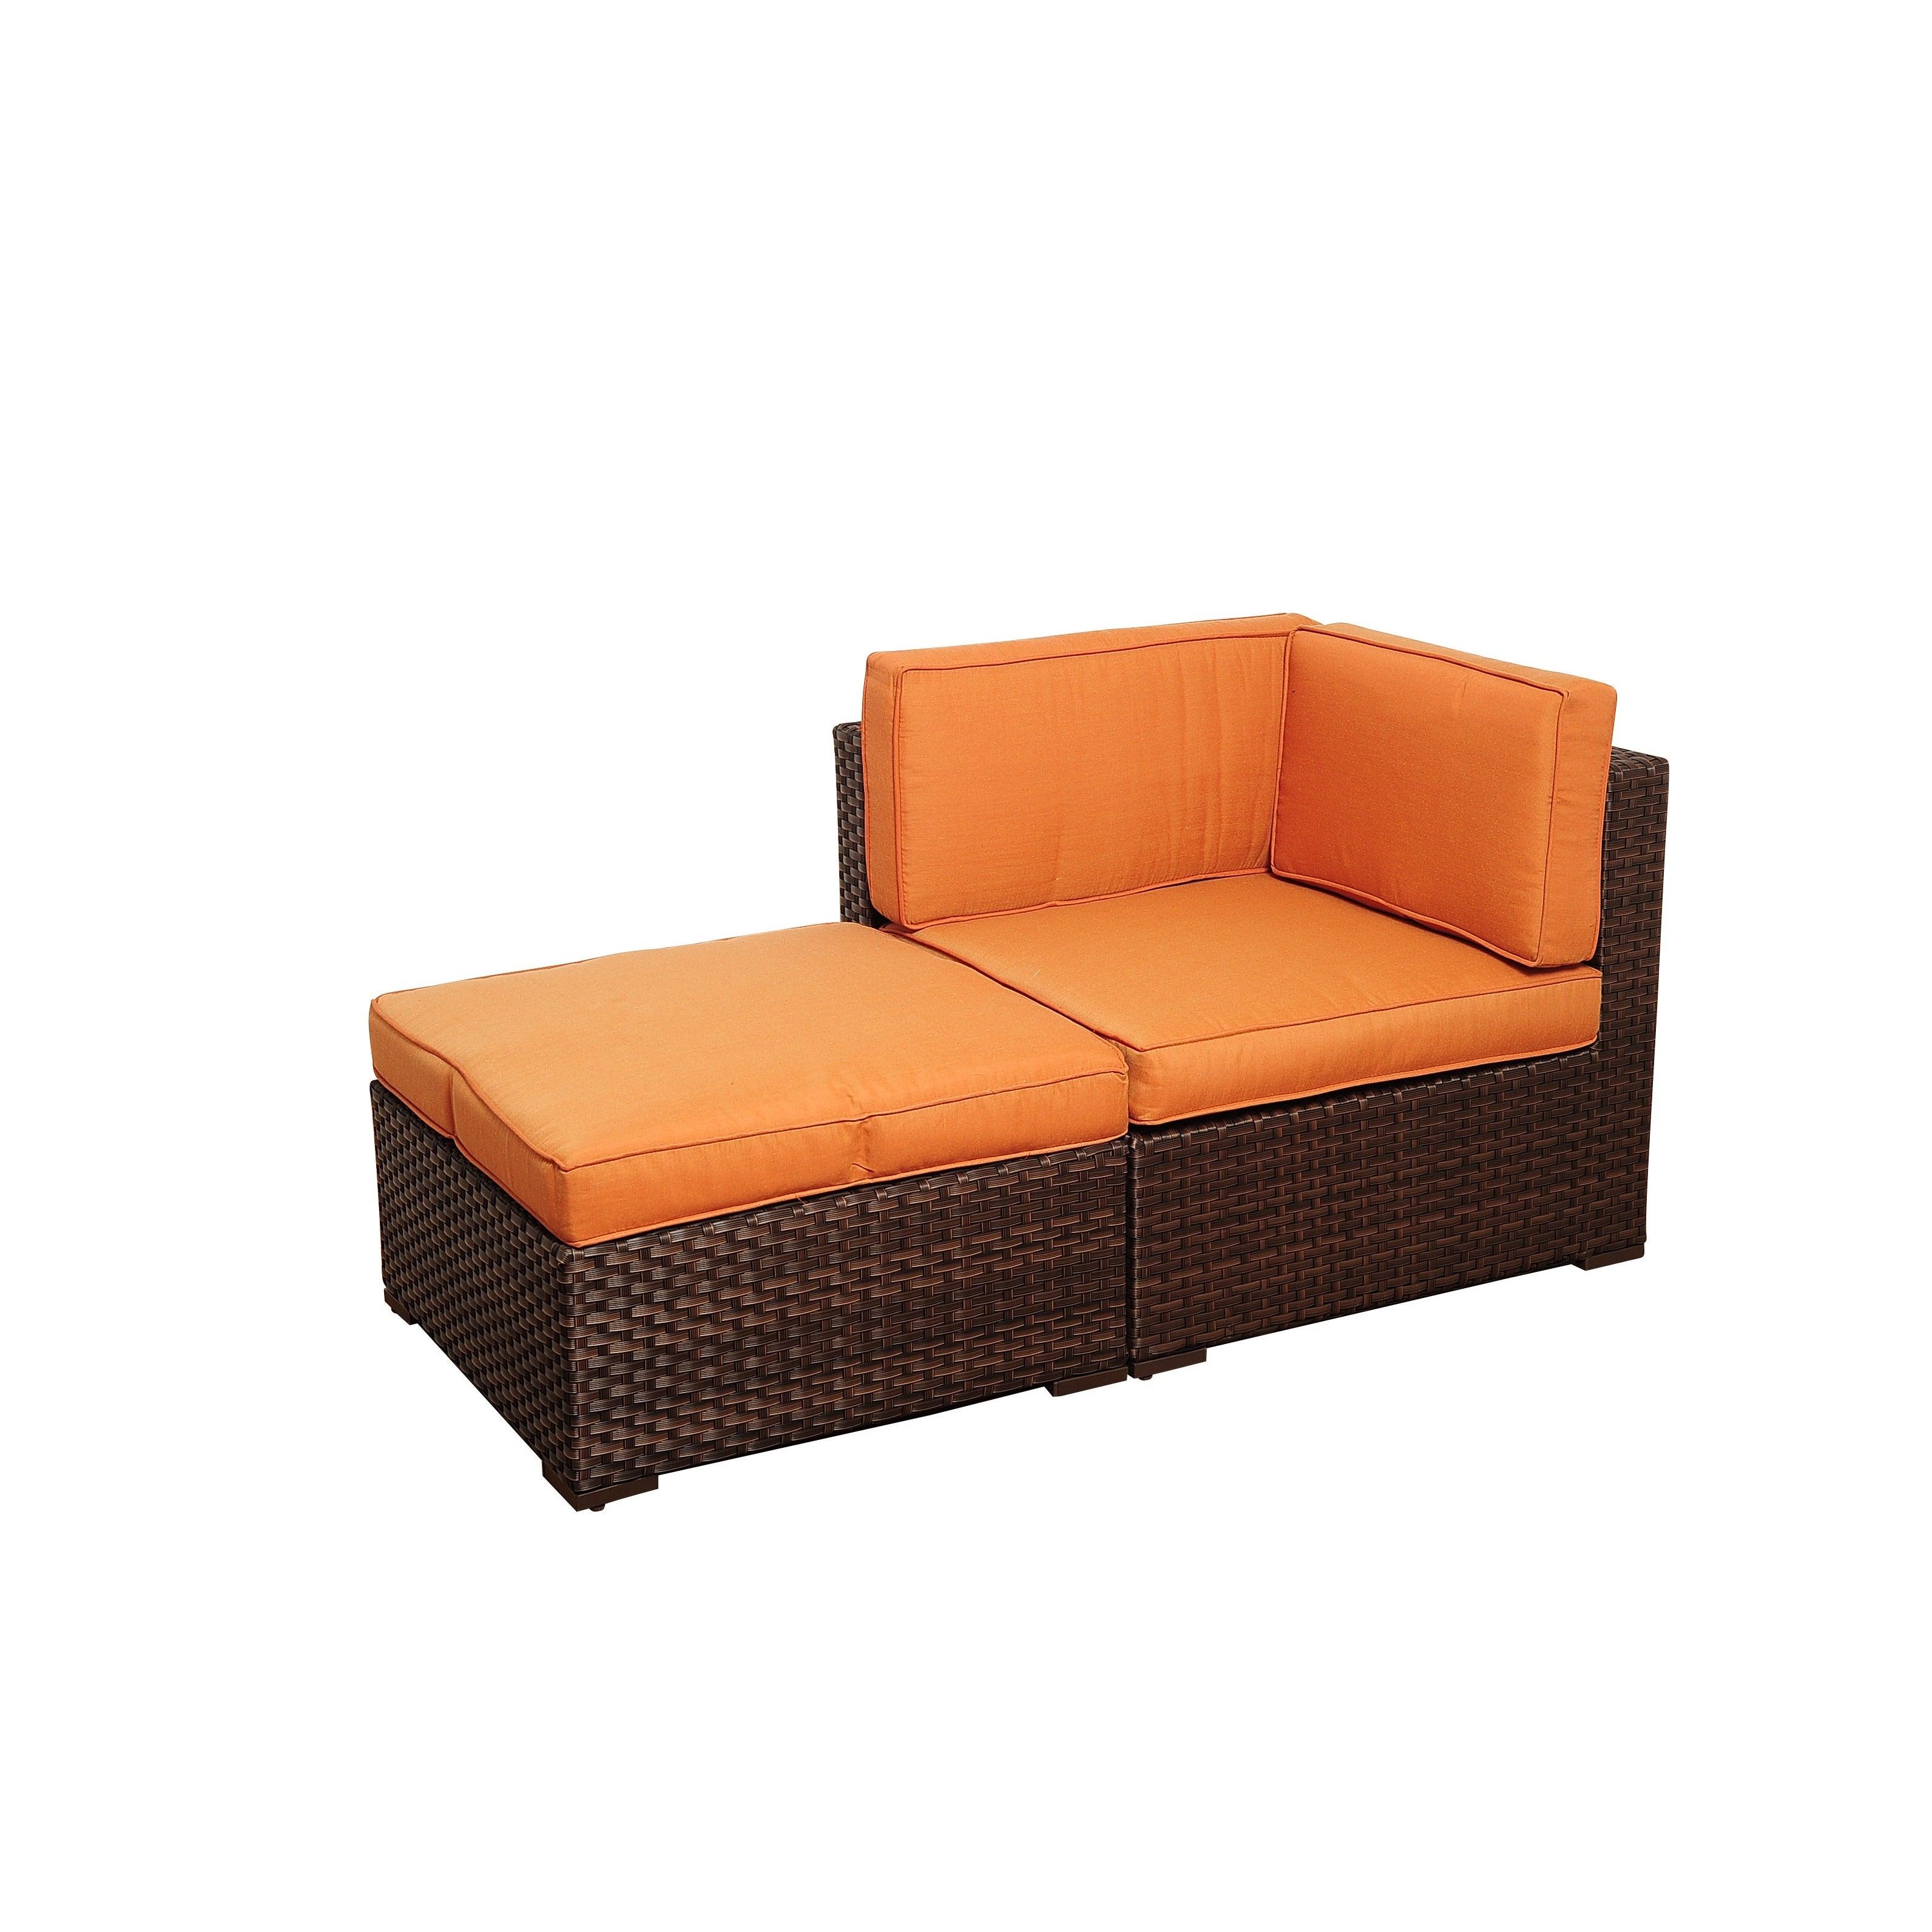 Atlantic Naples 7 Piece Patio Furniture Set Free Shipping Today 3476840